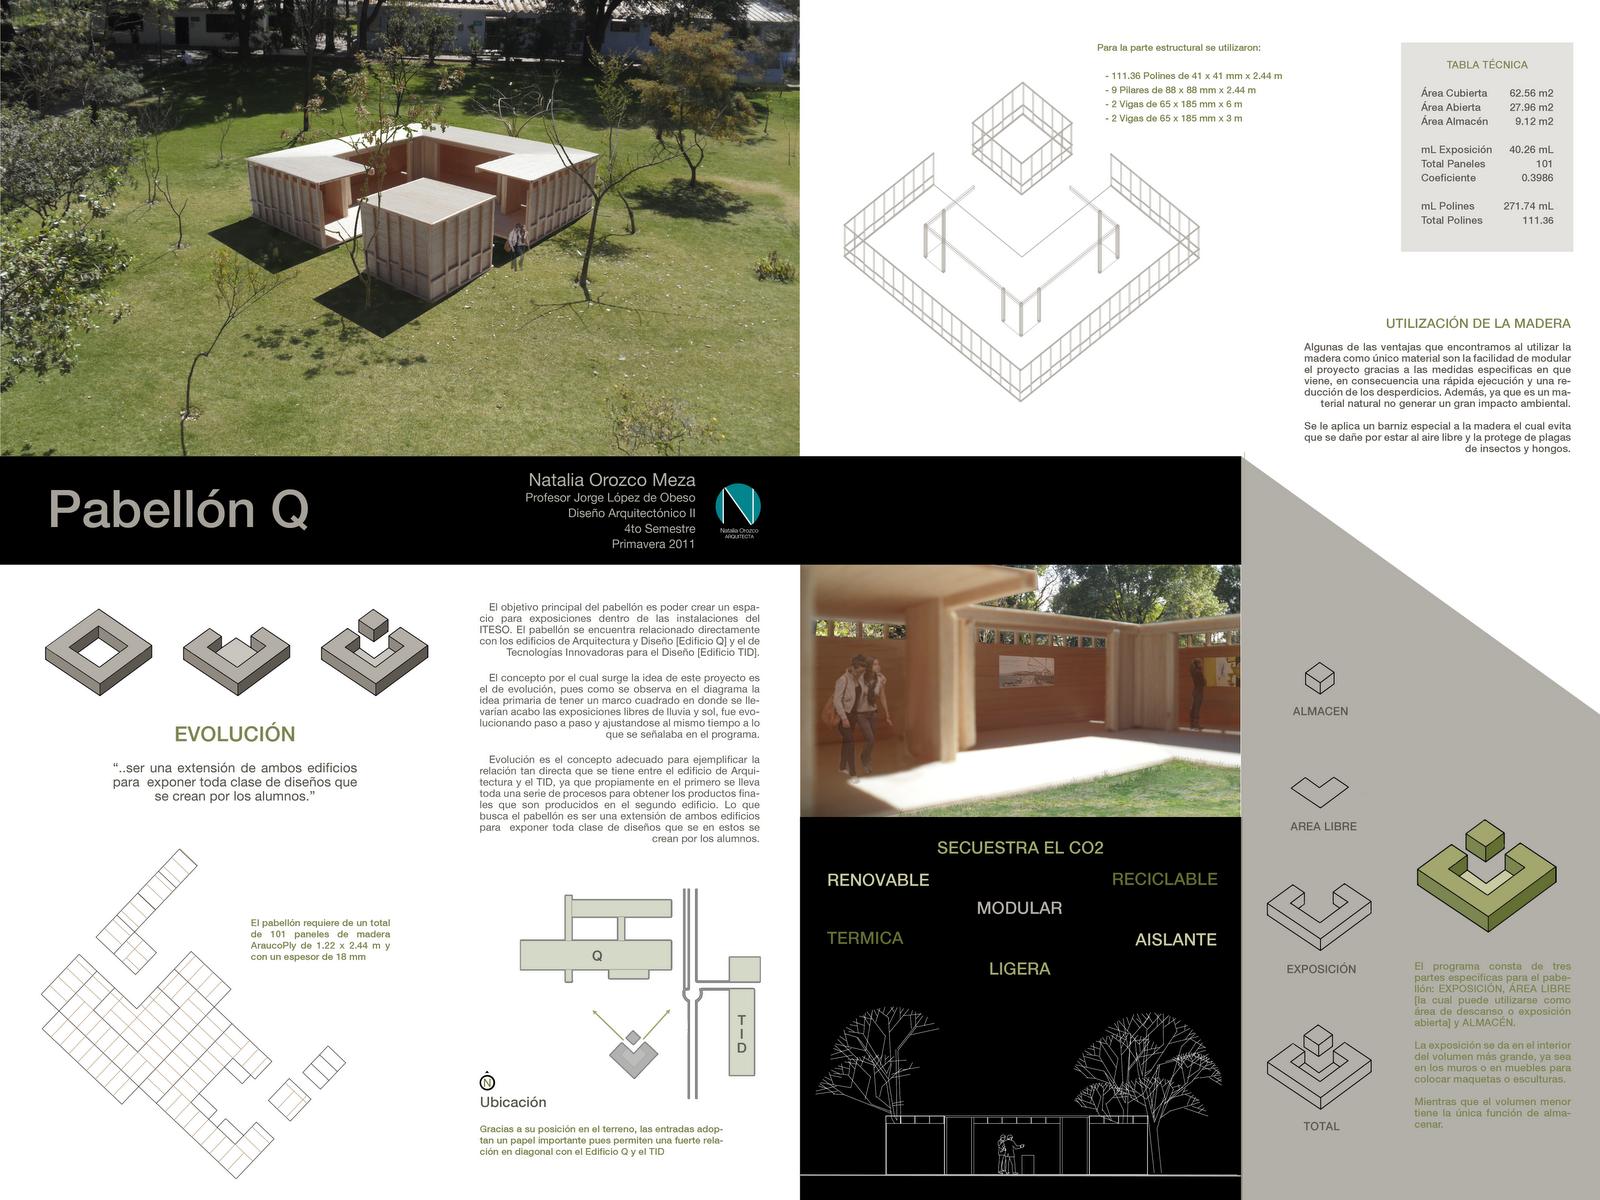 Dise o arquitect nico ii primavera 2011 iteso pabell n q for Concepto de arquitectura